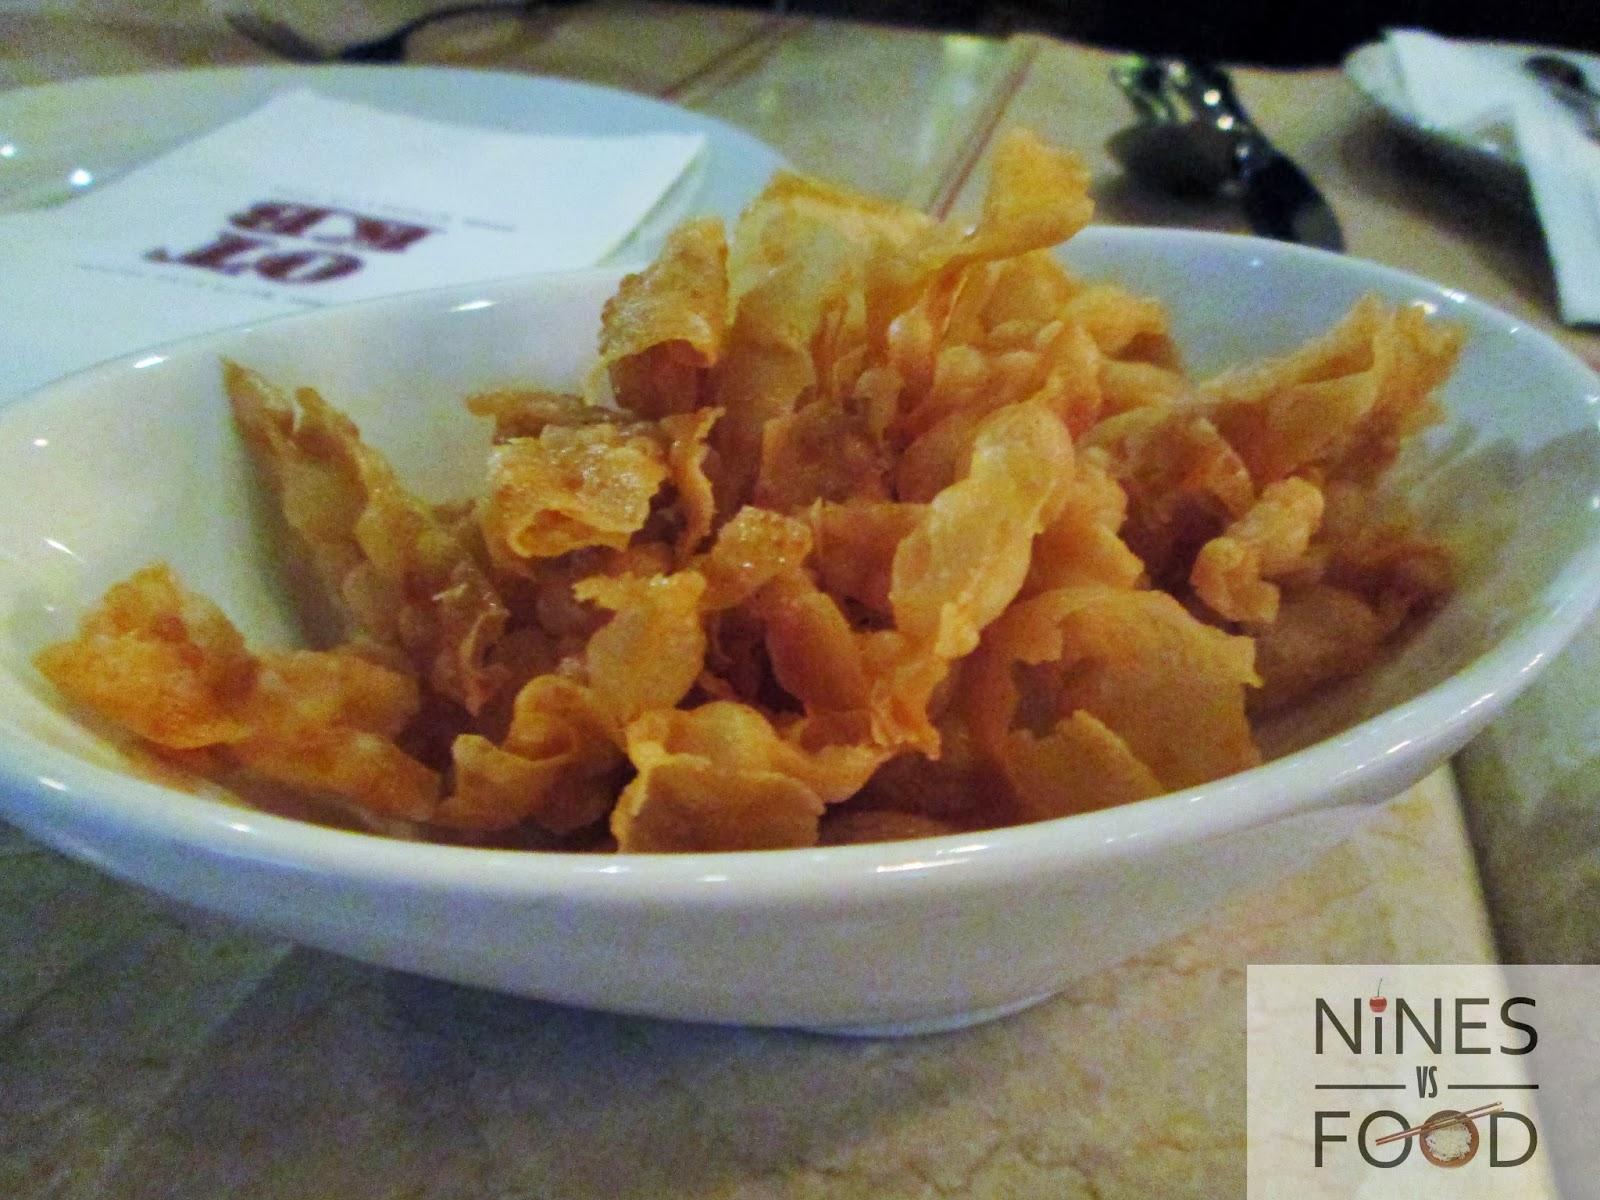 Nines vs. Food - Olive Tree Kitchen and Bar-5.jpg